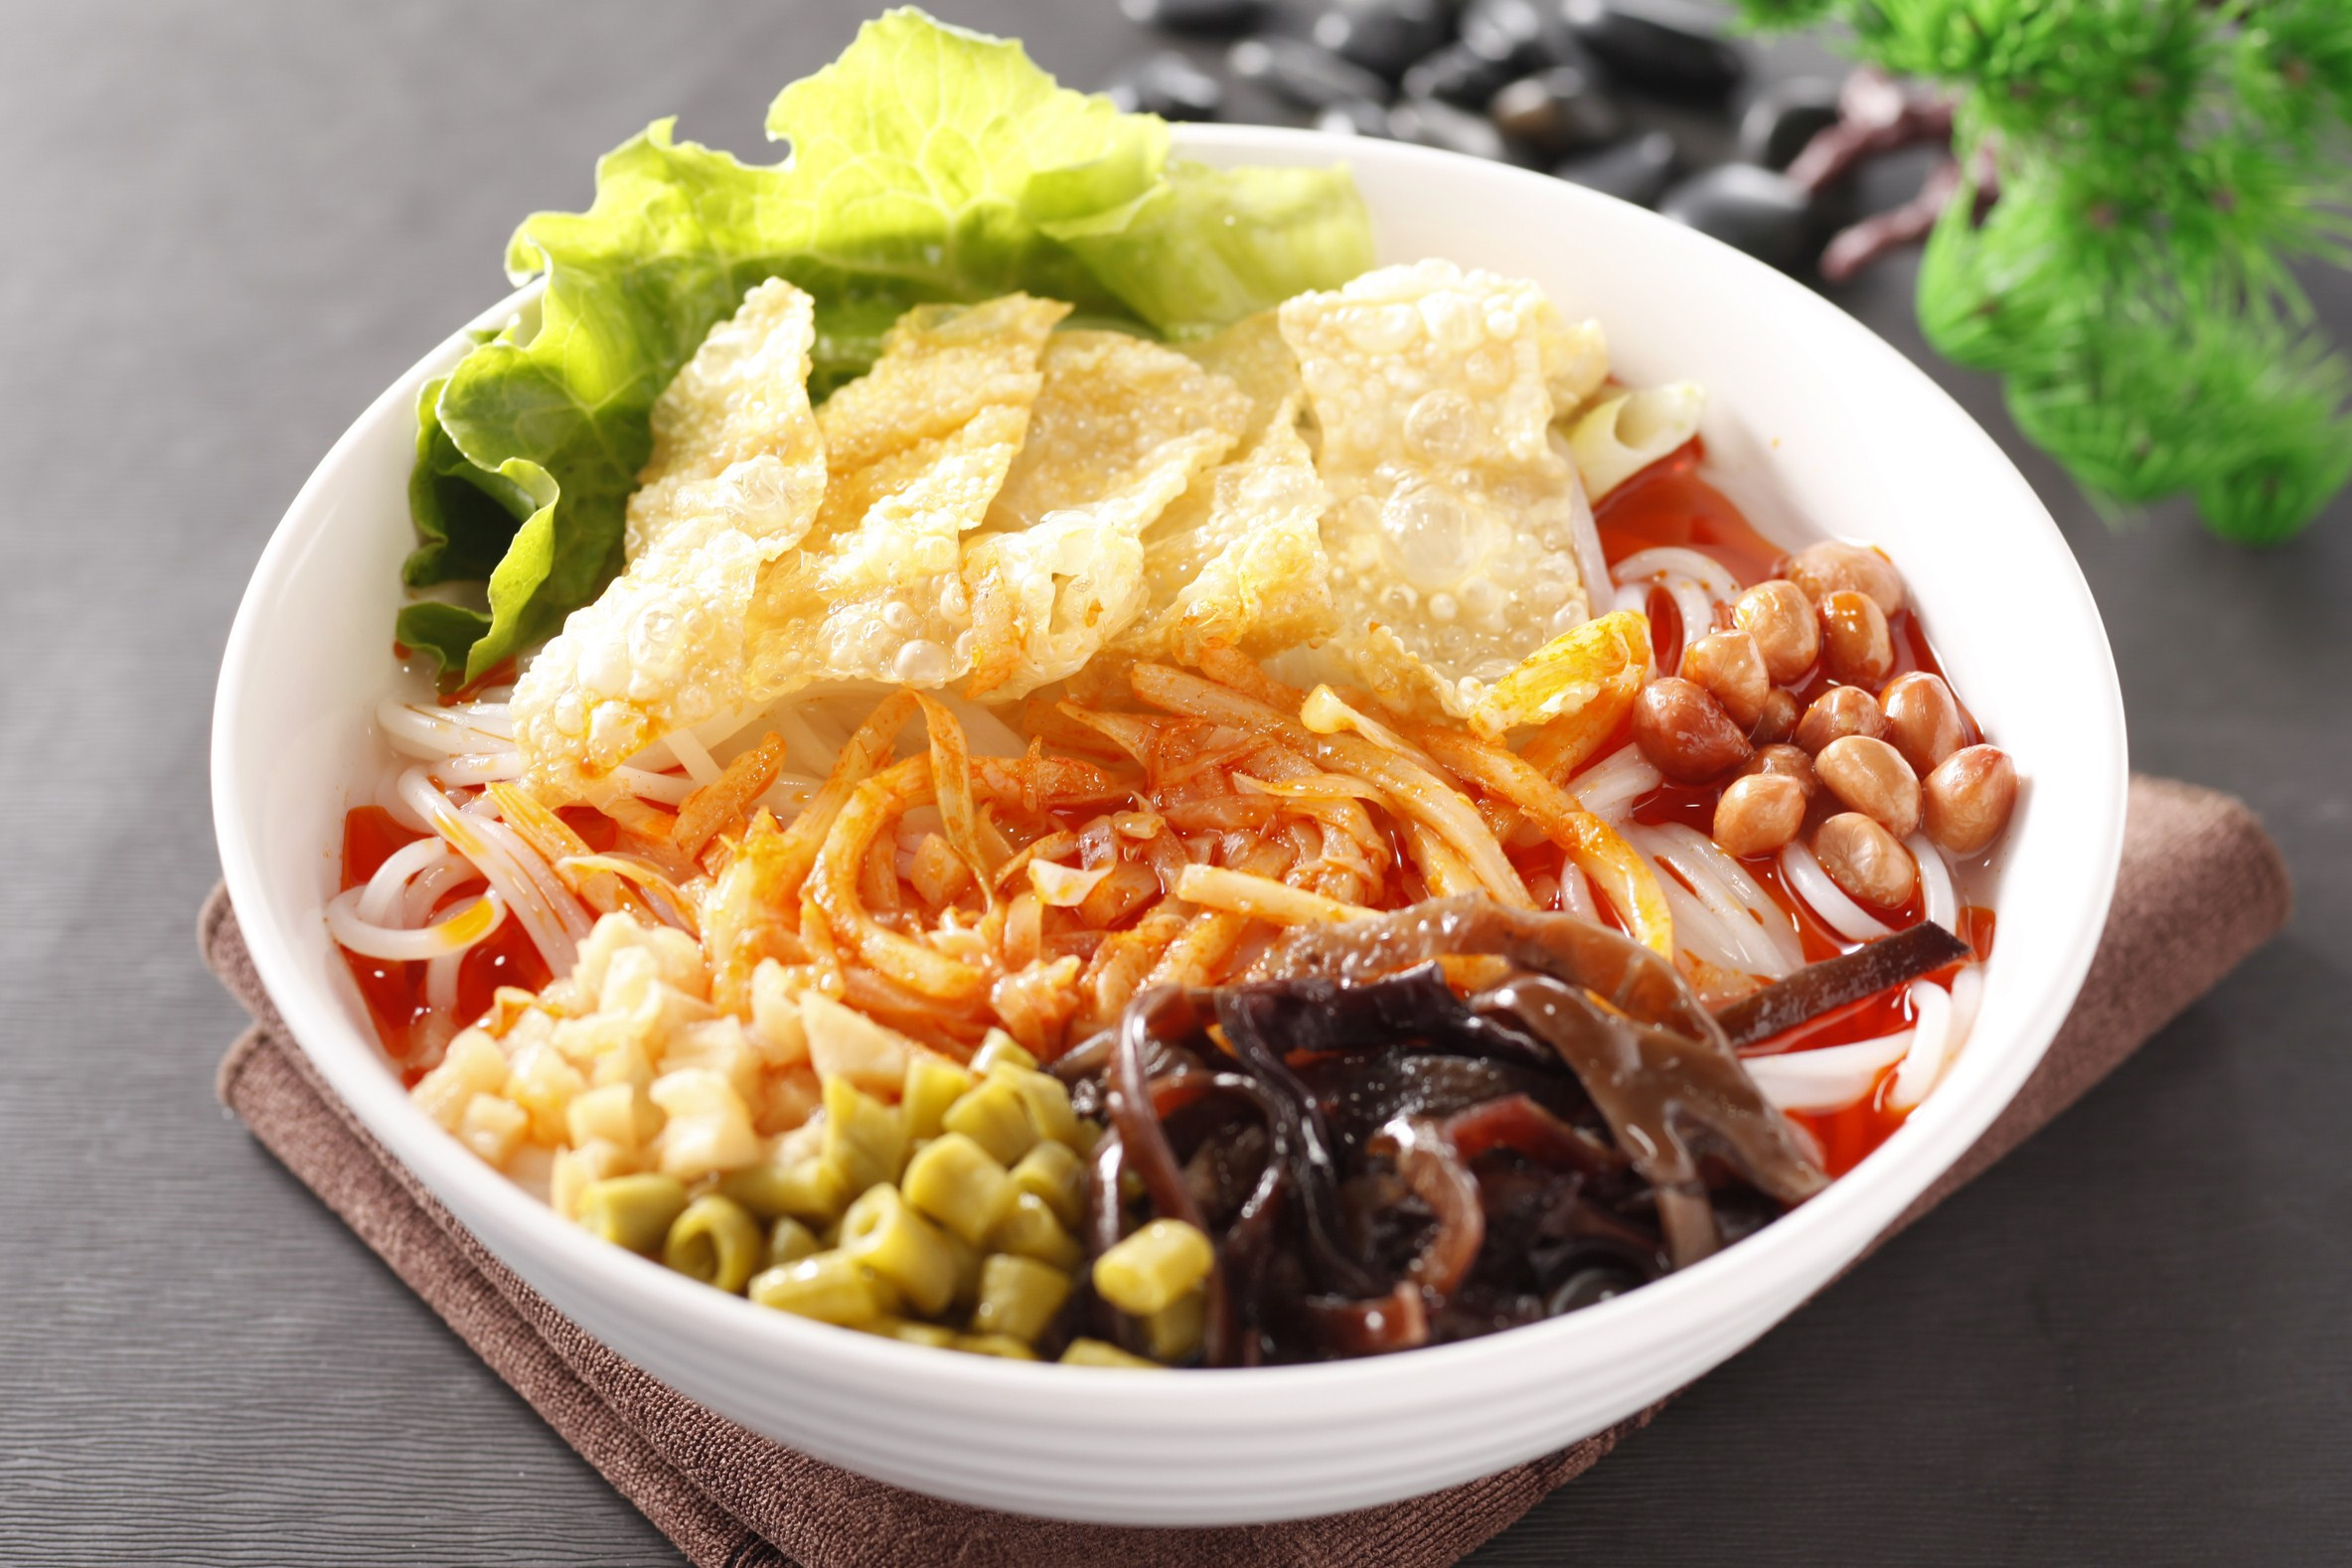 liuzhou water snail rice noodle